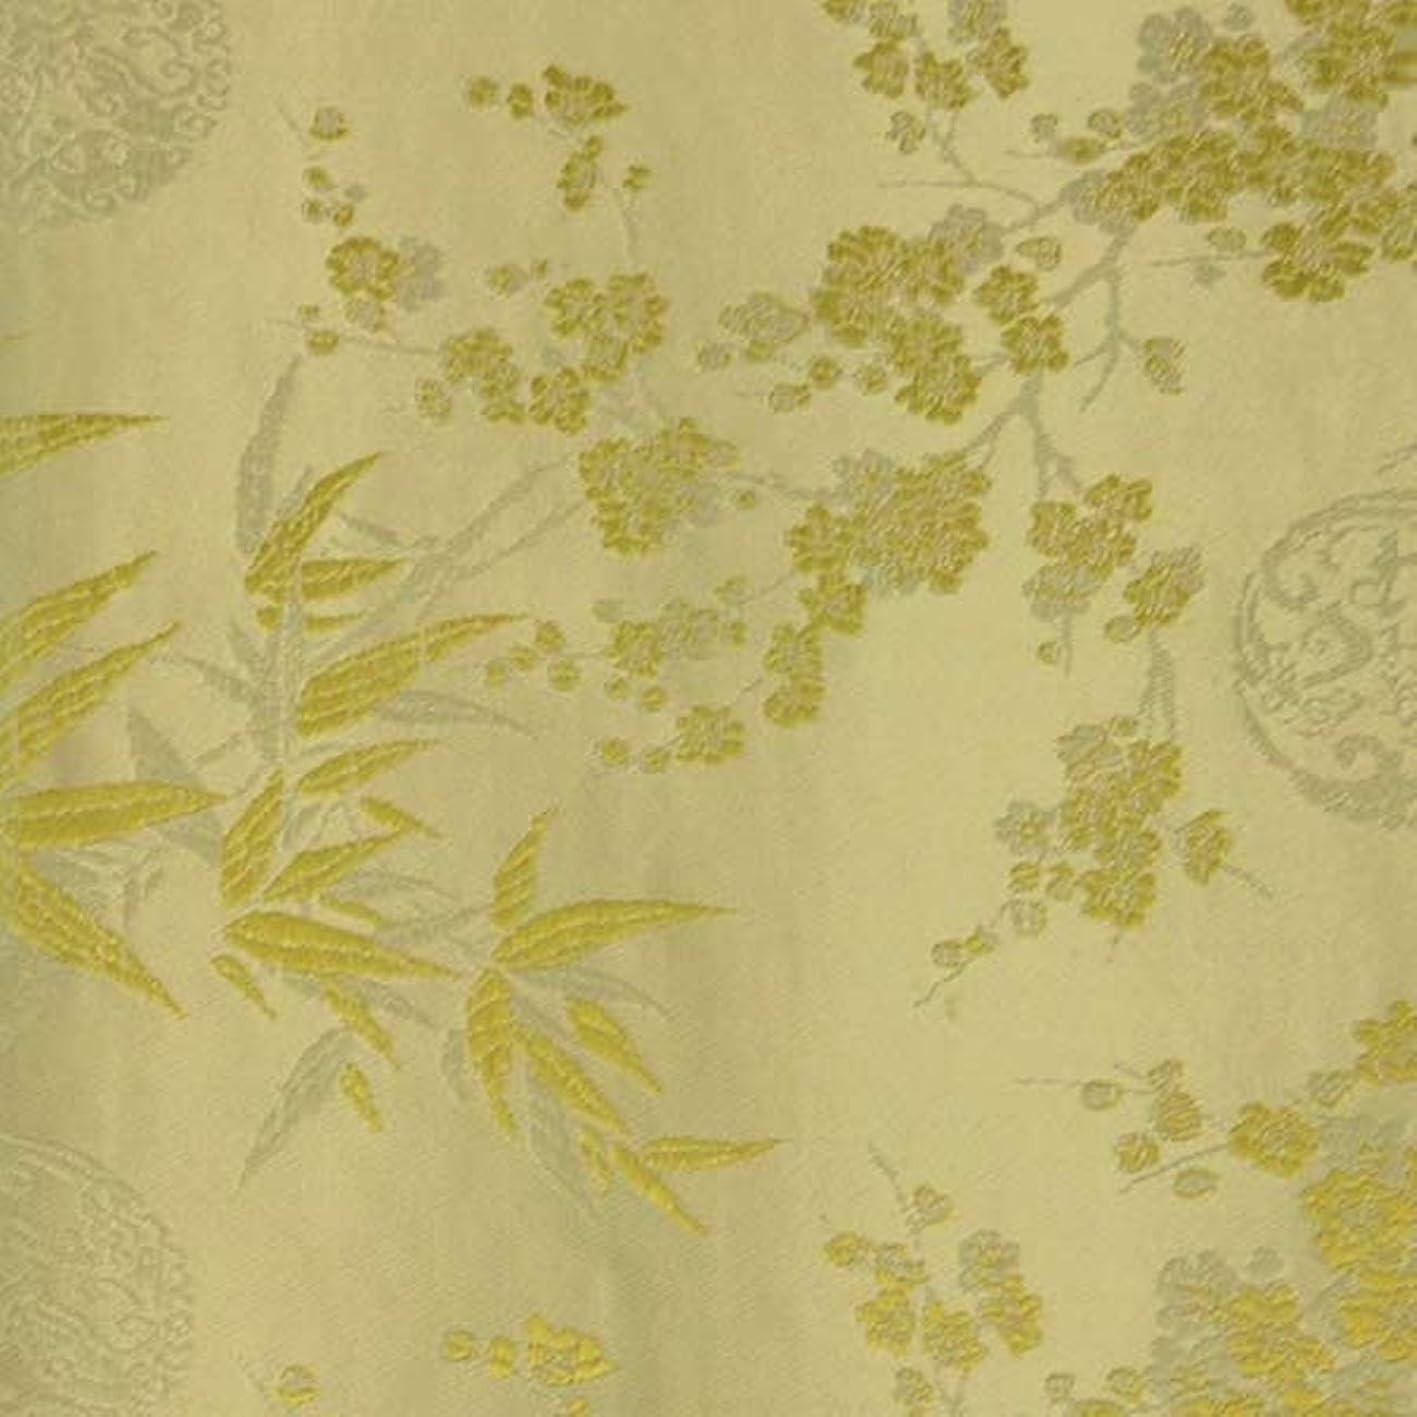 Wrapables Bamboo Satin Brocade Decorative Paper, Golden/Cream, Set of 3 igumvqxzeij971